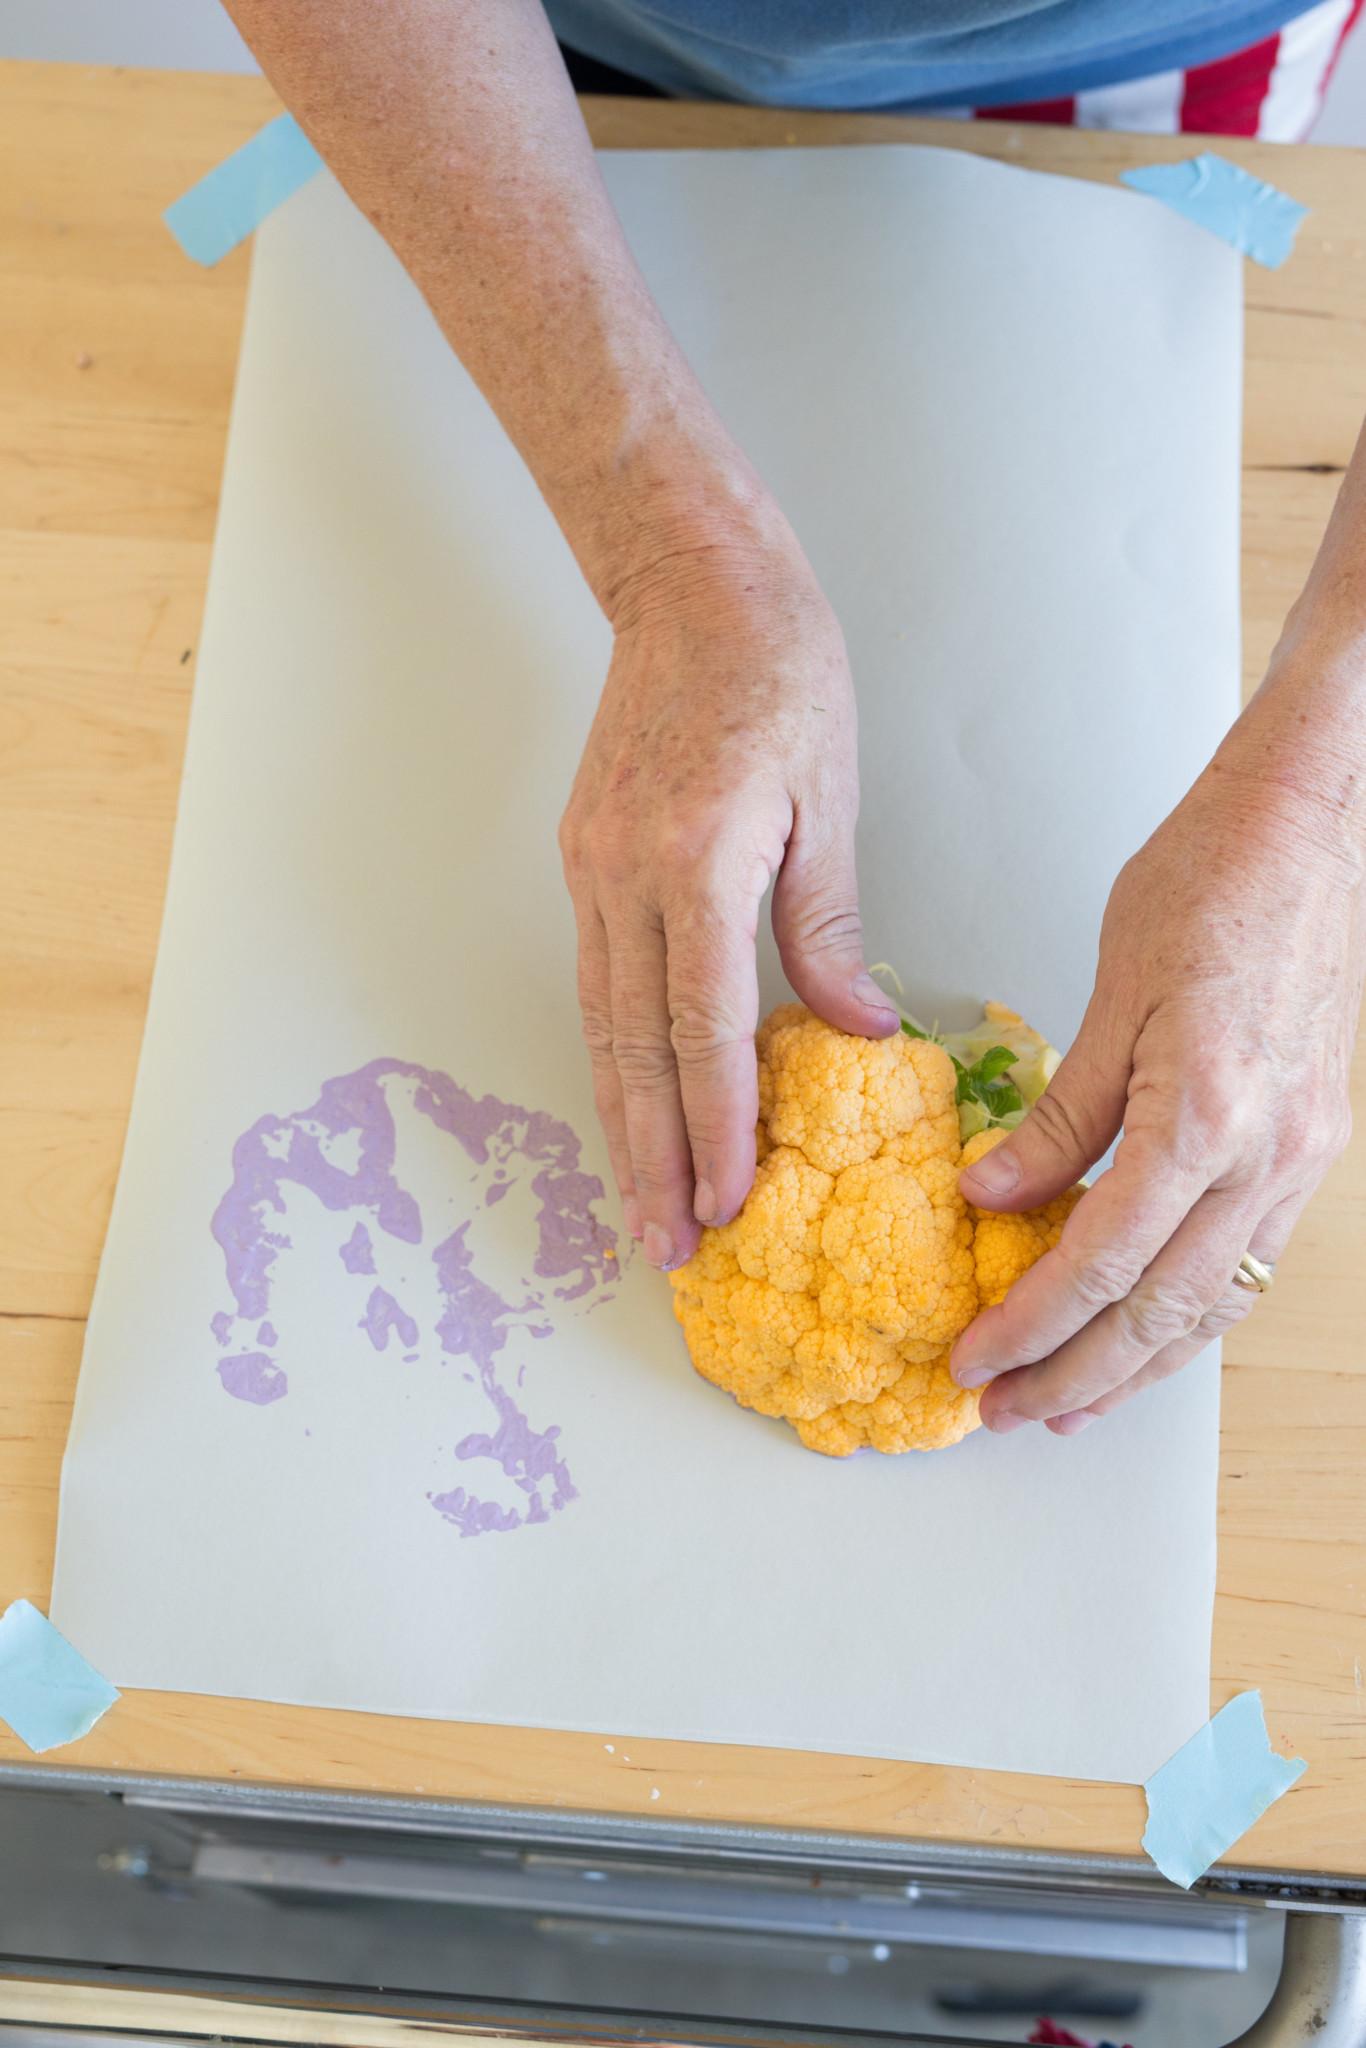 DIY Cauliflower Art from Libbie Summers (photo by teresa earnest)